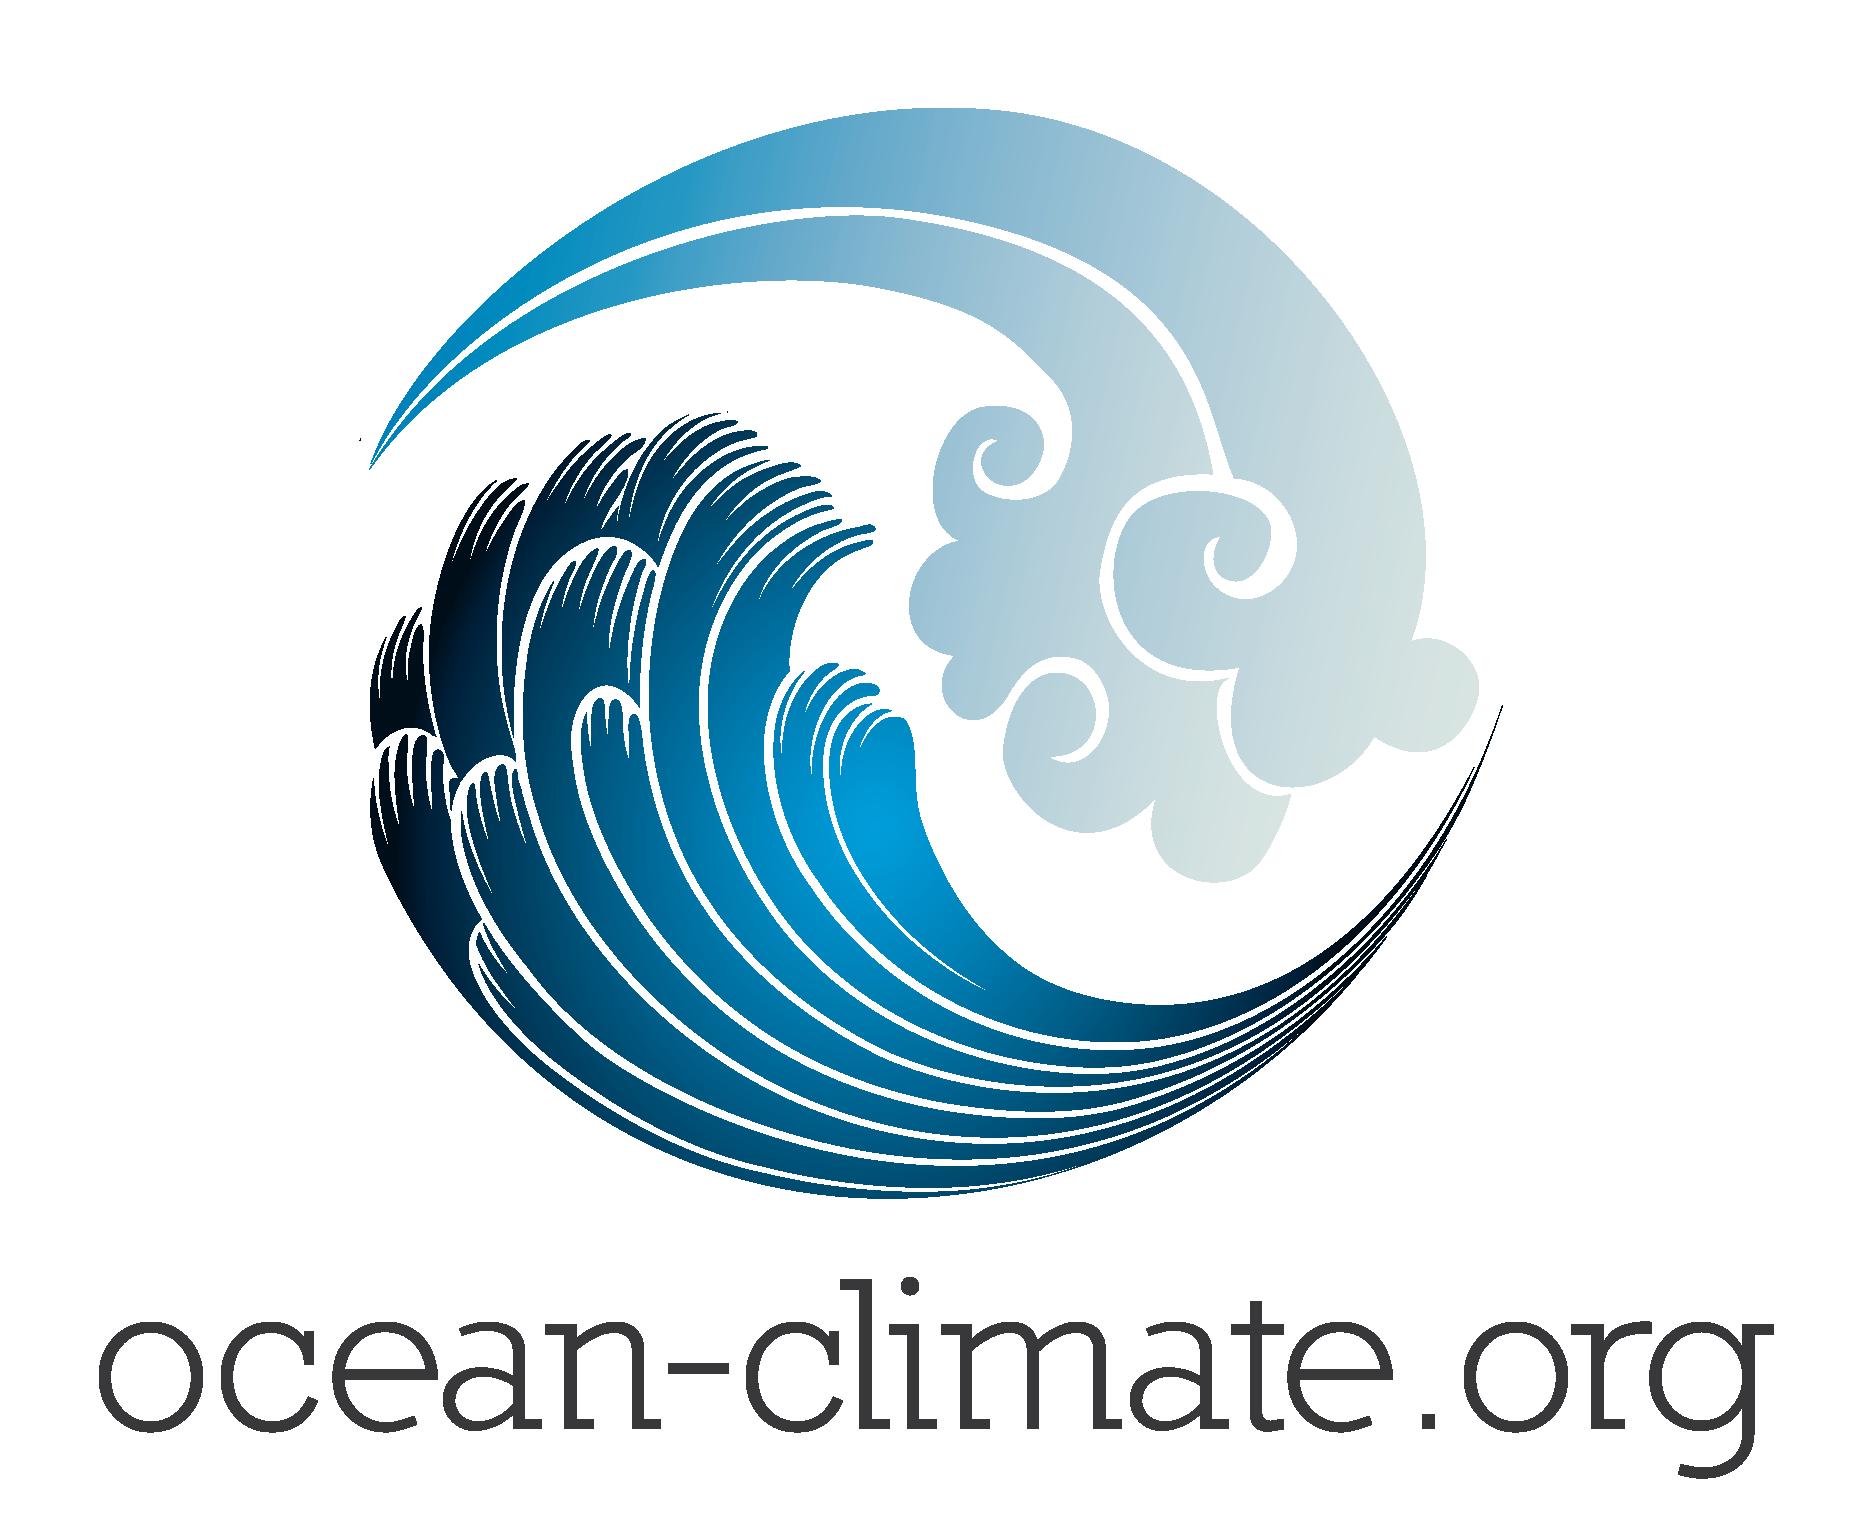 Logo_ocean-climate.org